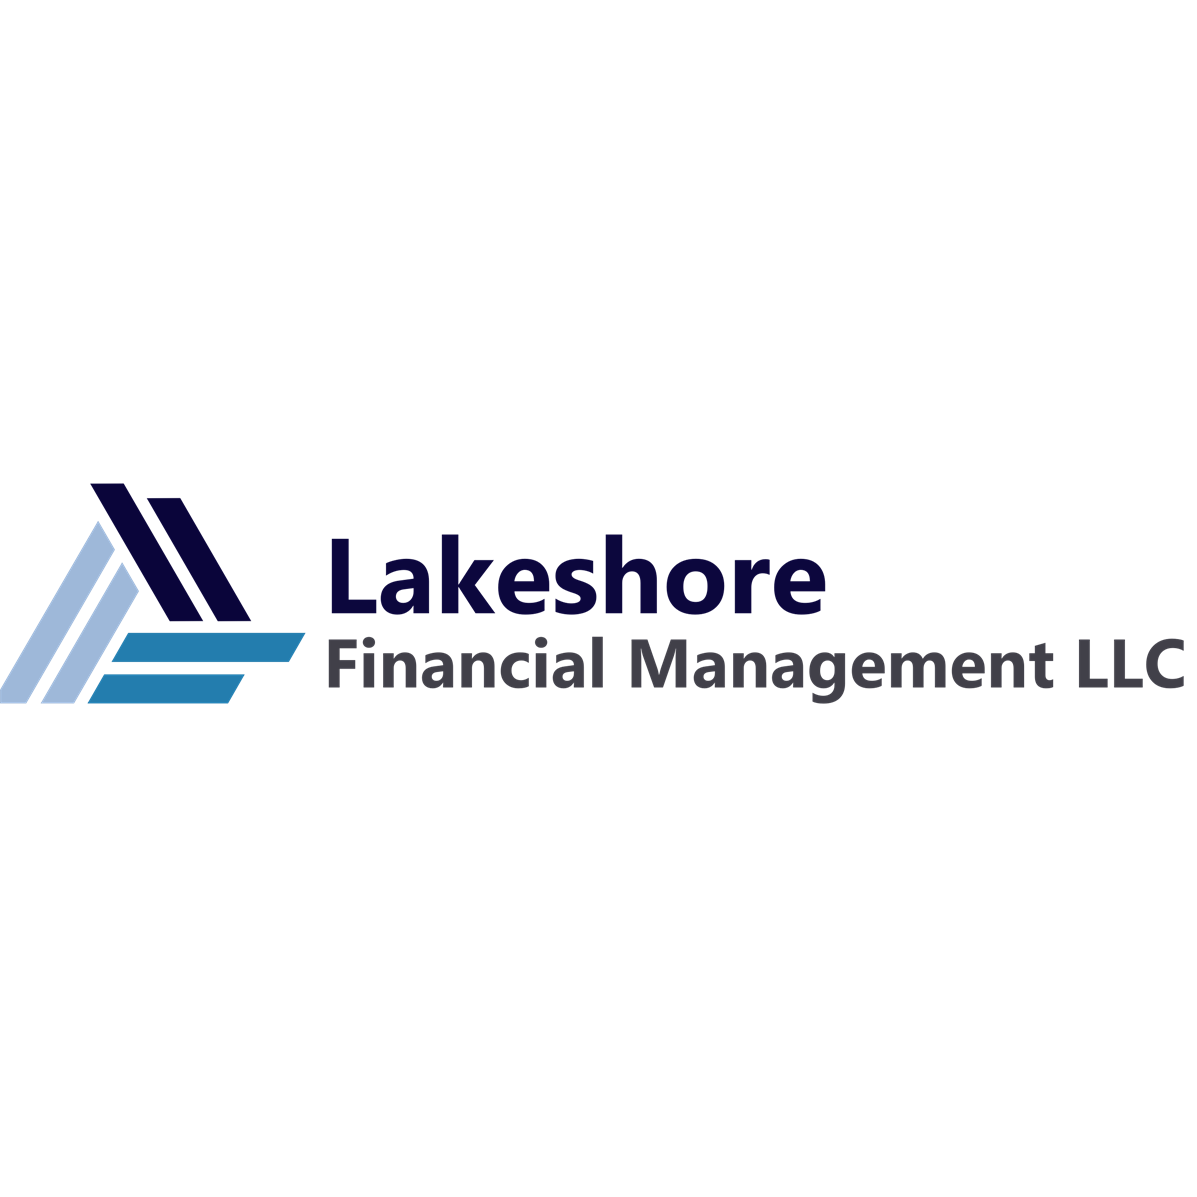 Lakeshore Financial Management image 3